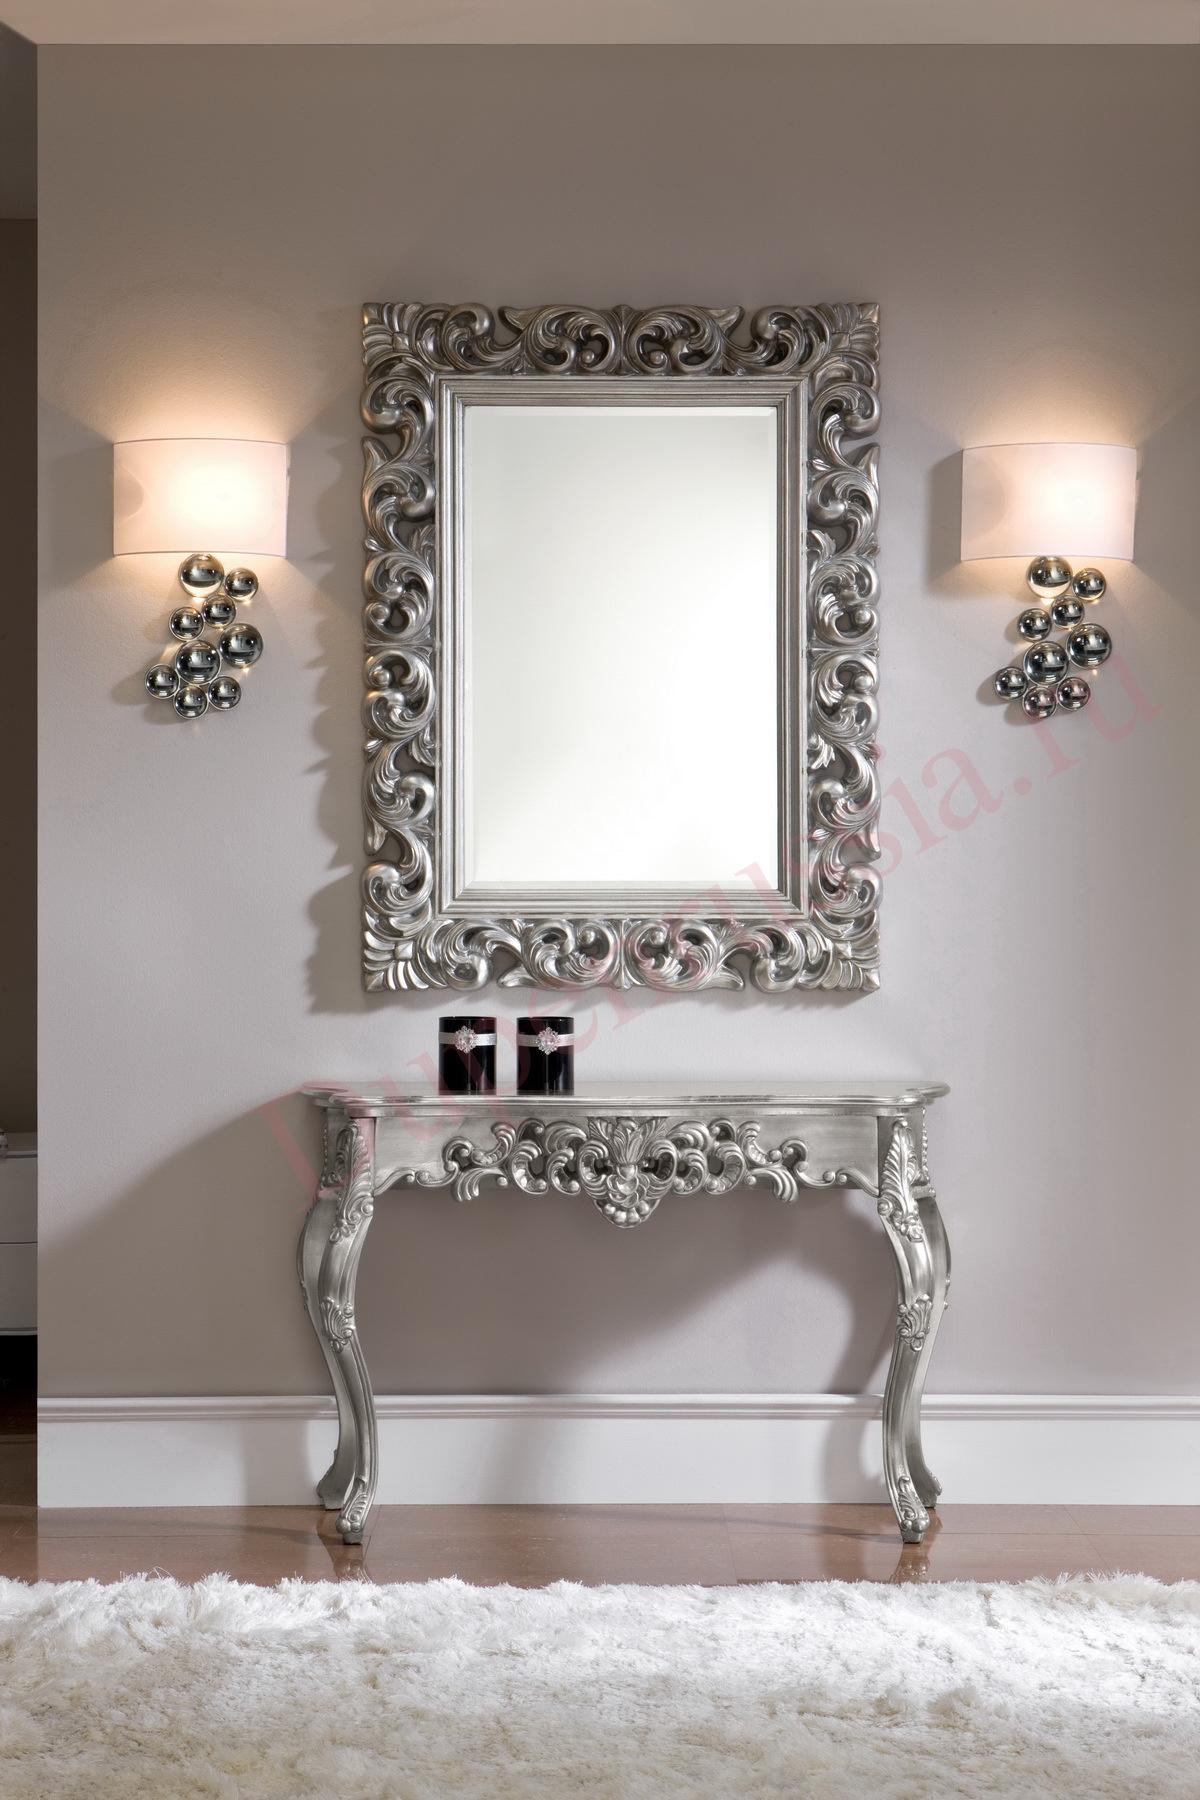 Зеркало DUPEN PU049 серебро (90*120), Консоль DUPEN К58 серебро